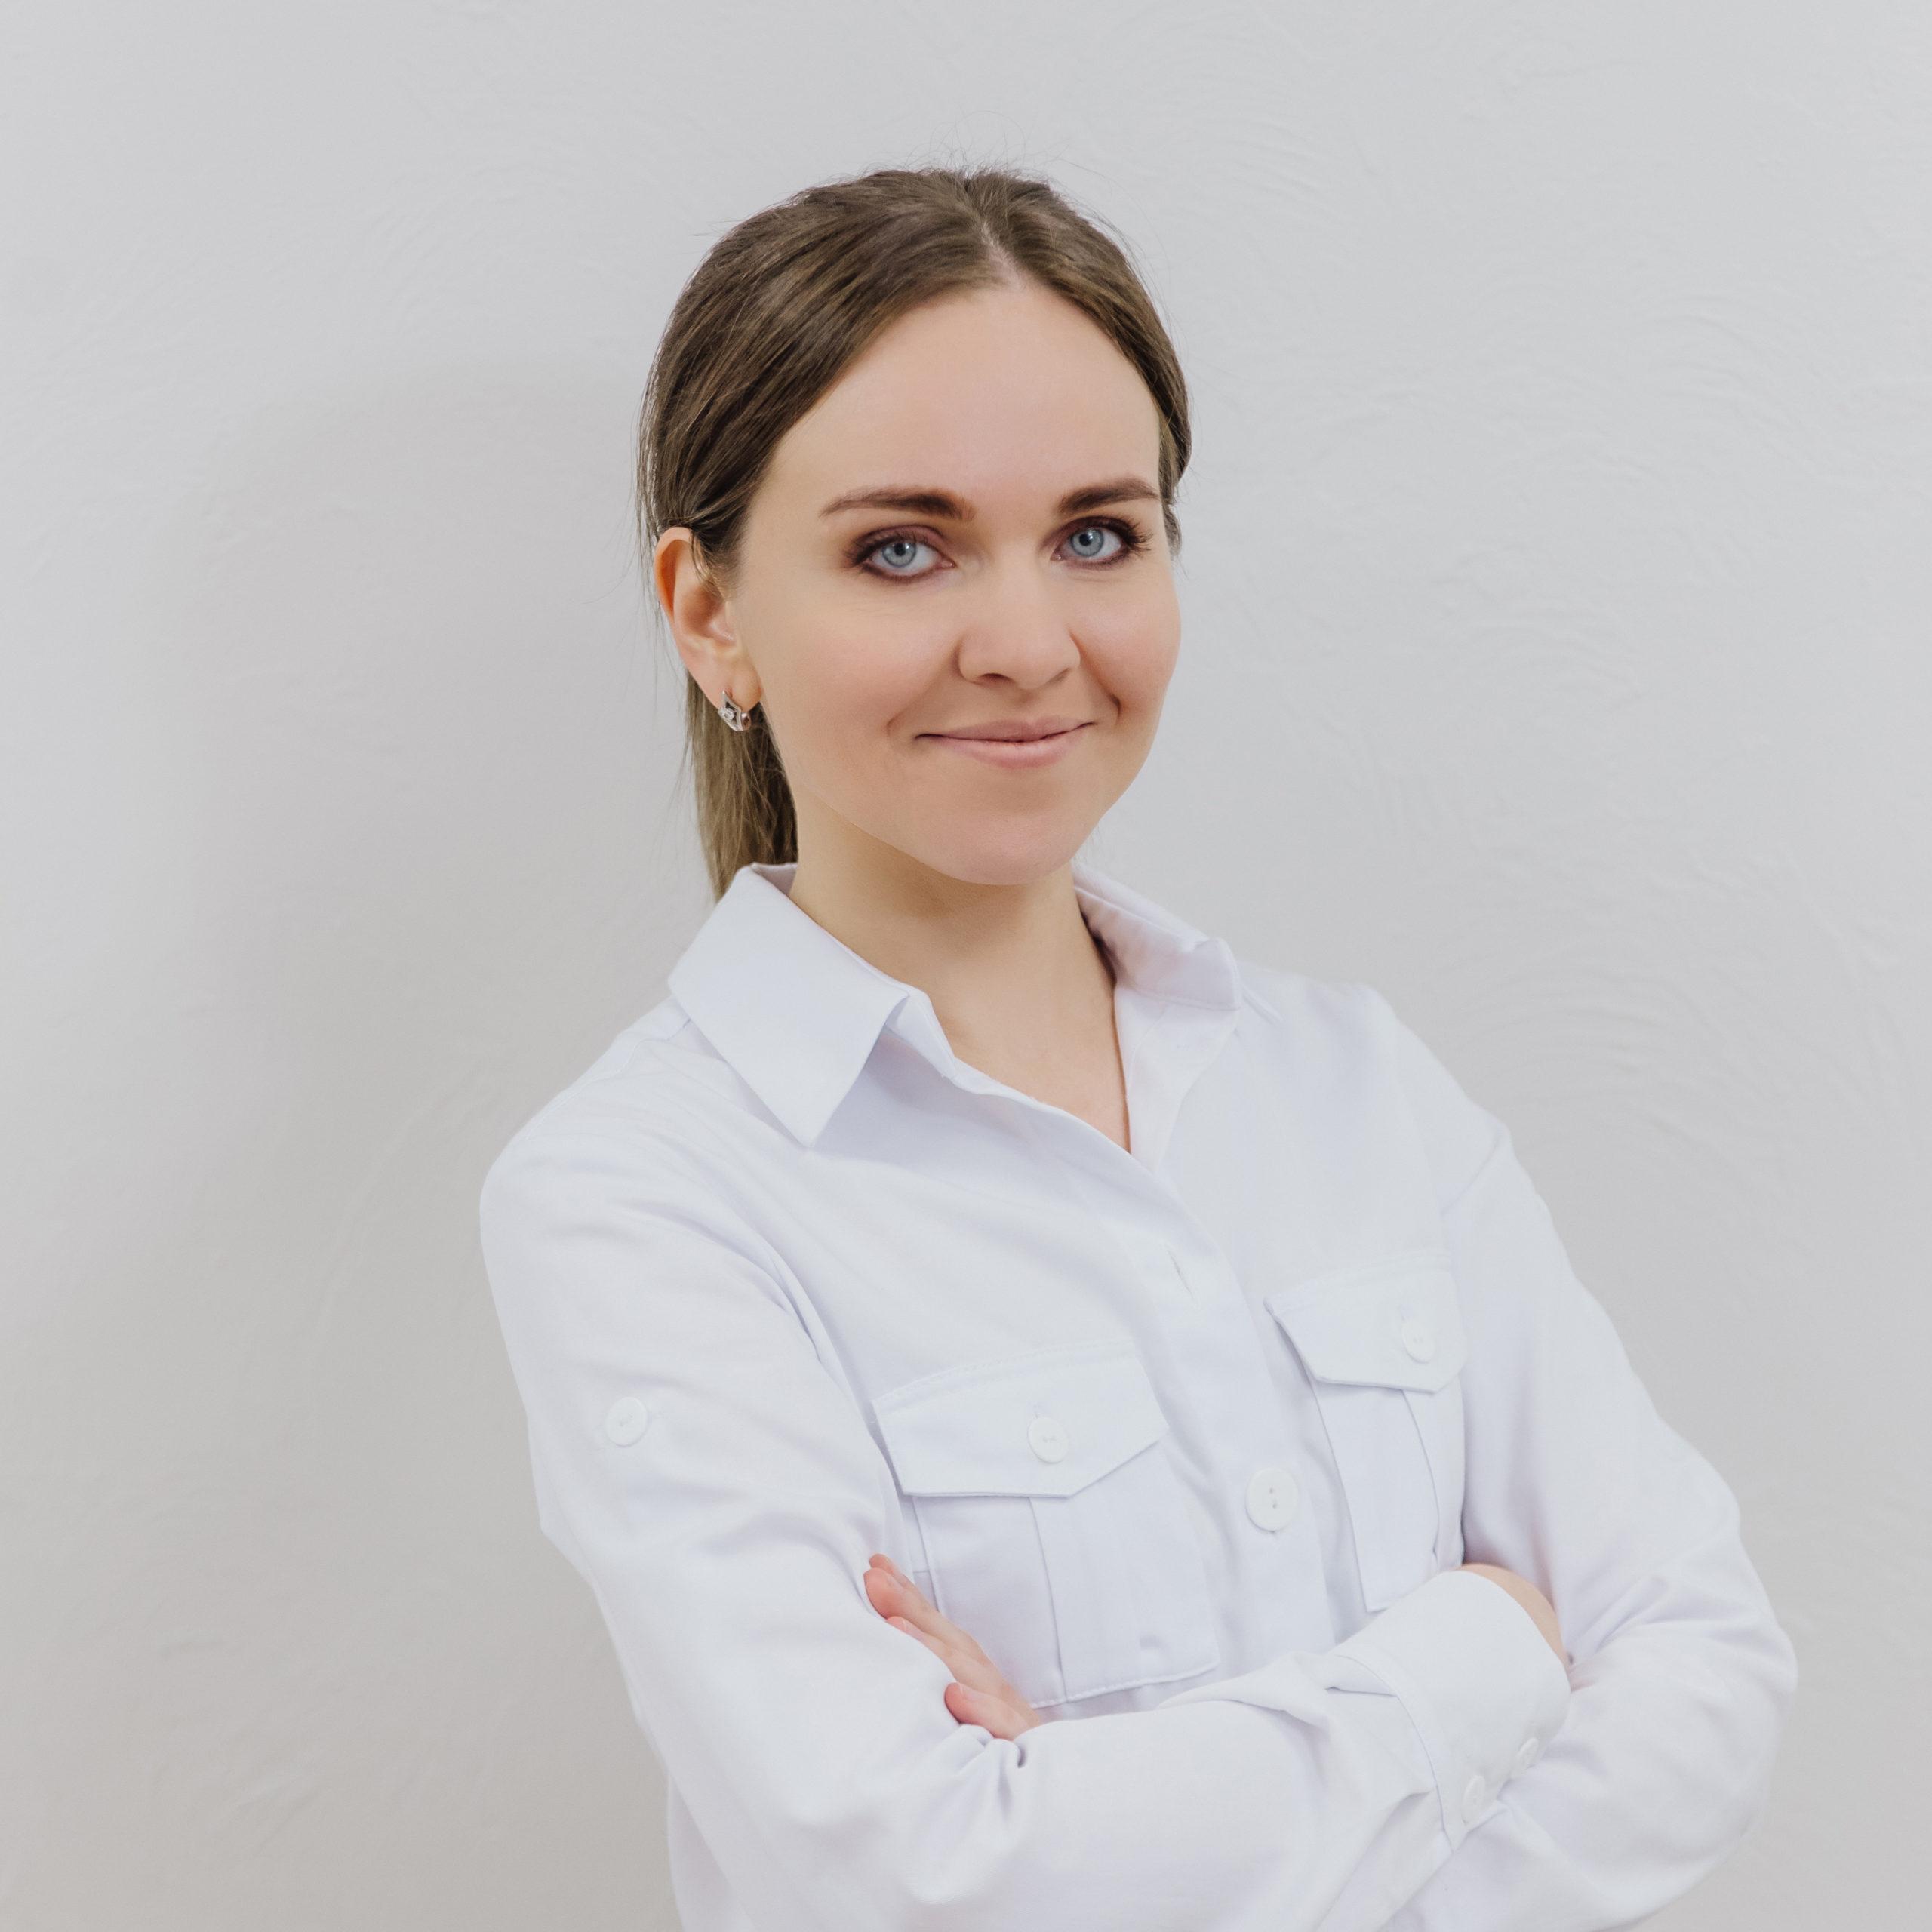 Тюрина Мария Сергеевна